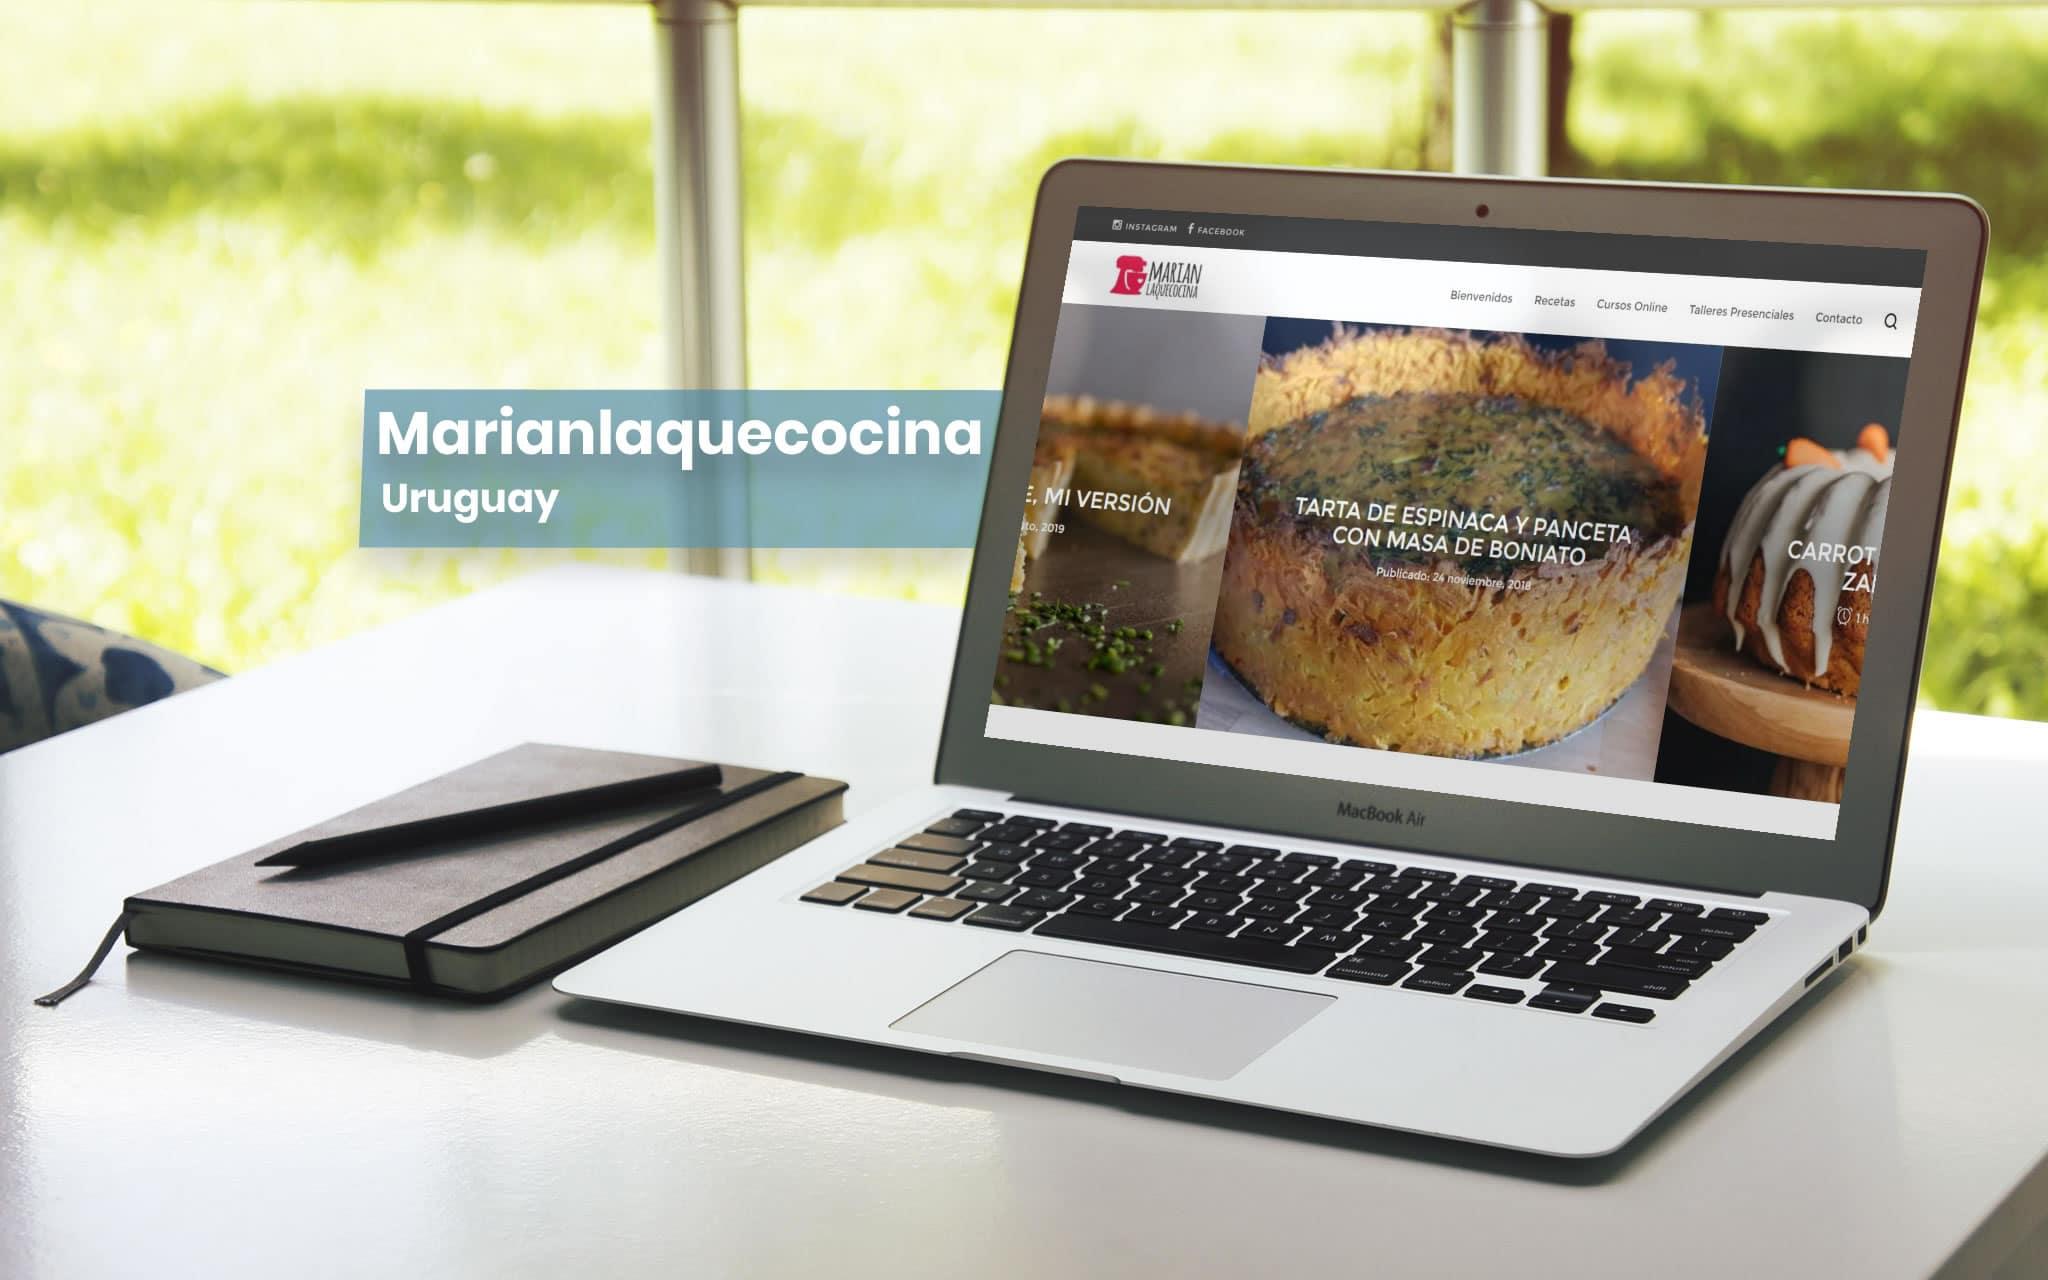 Marianlaquecocina